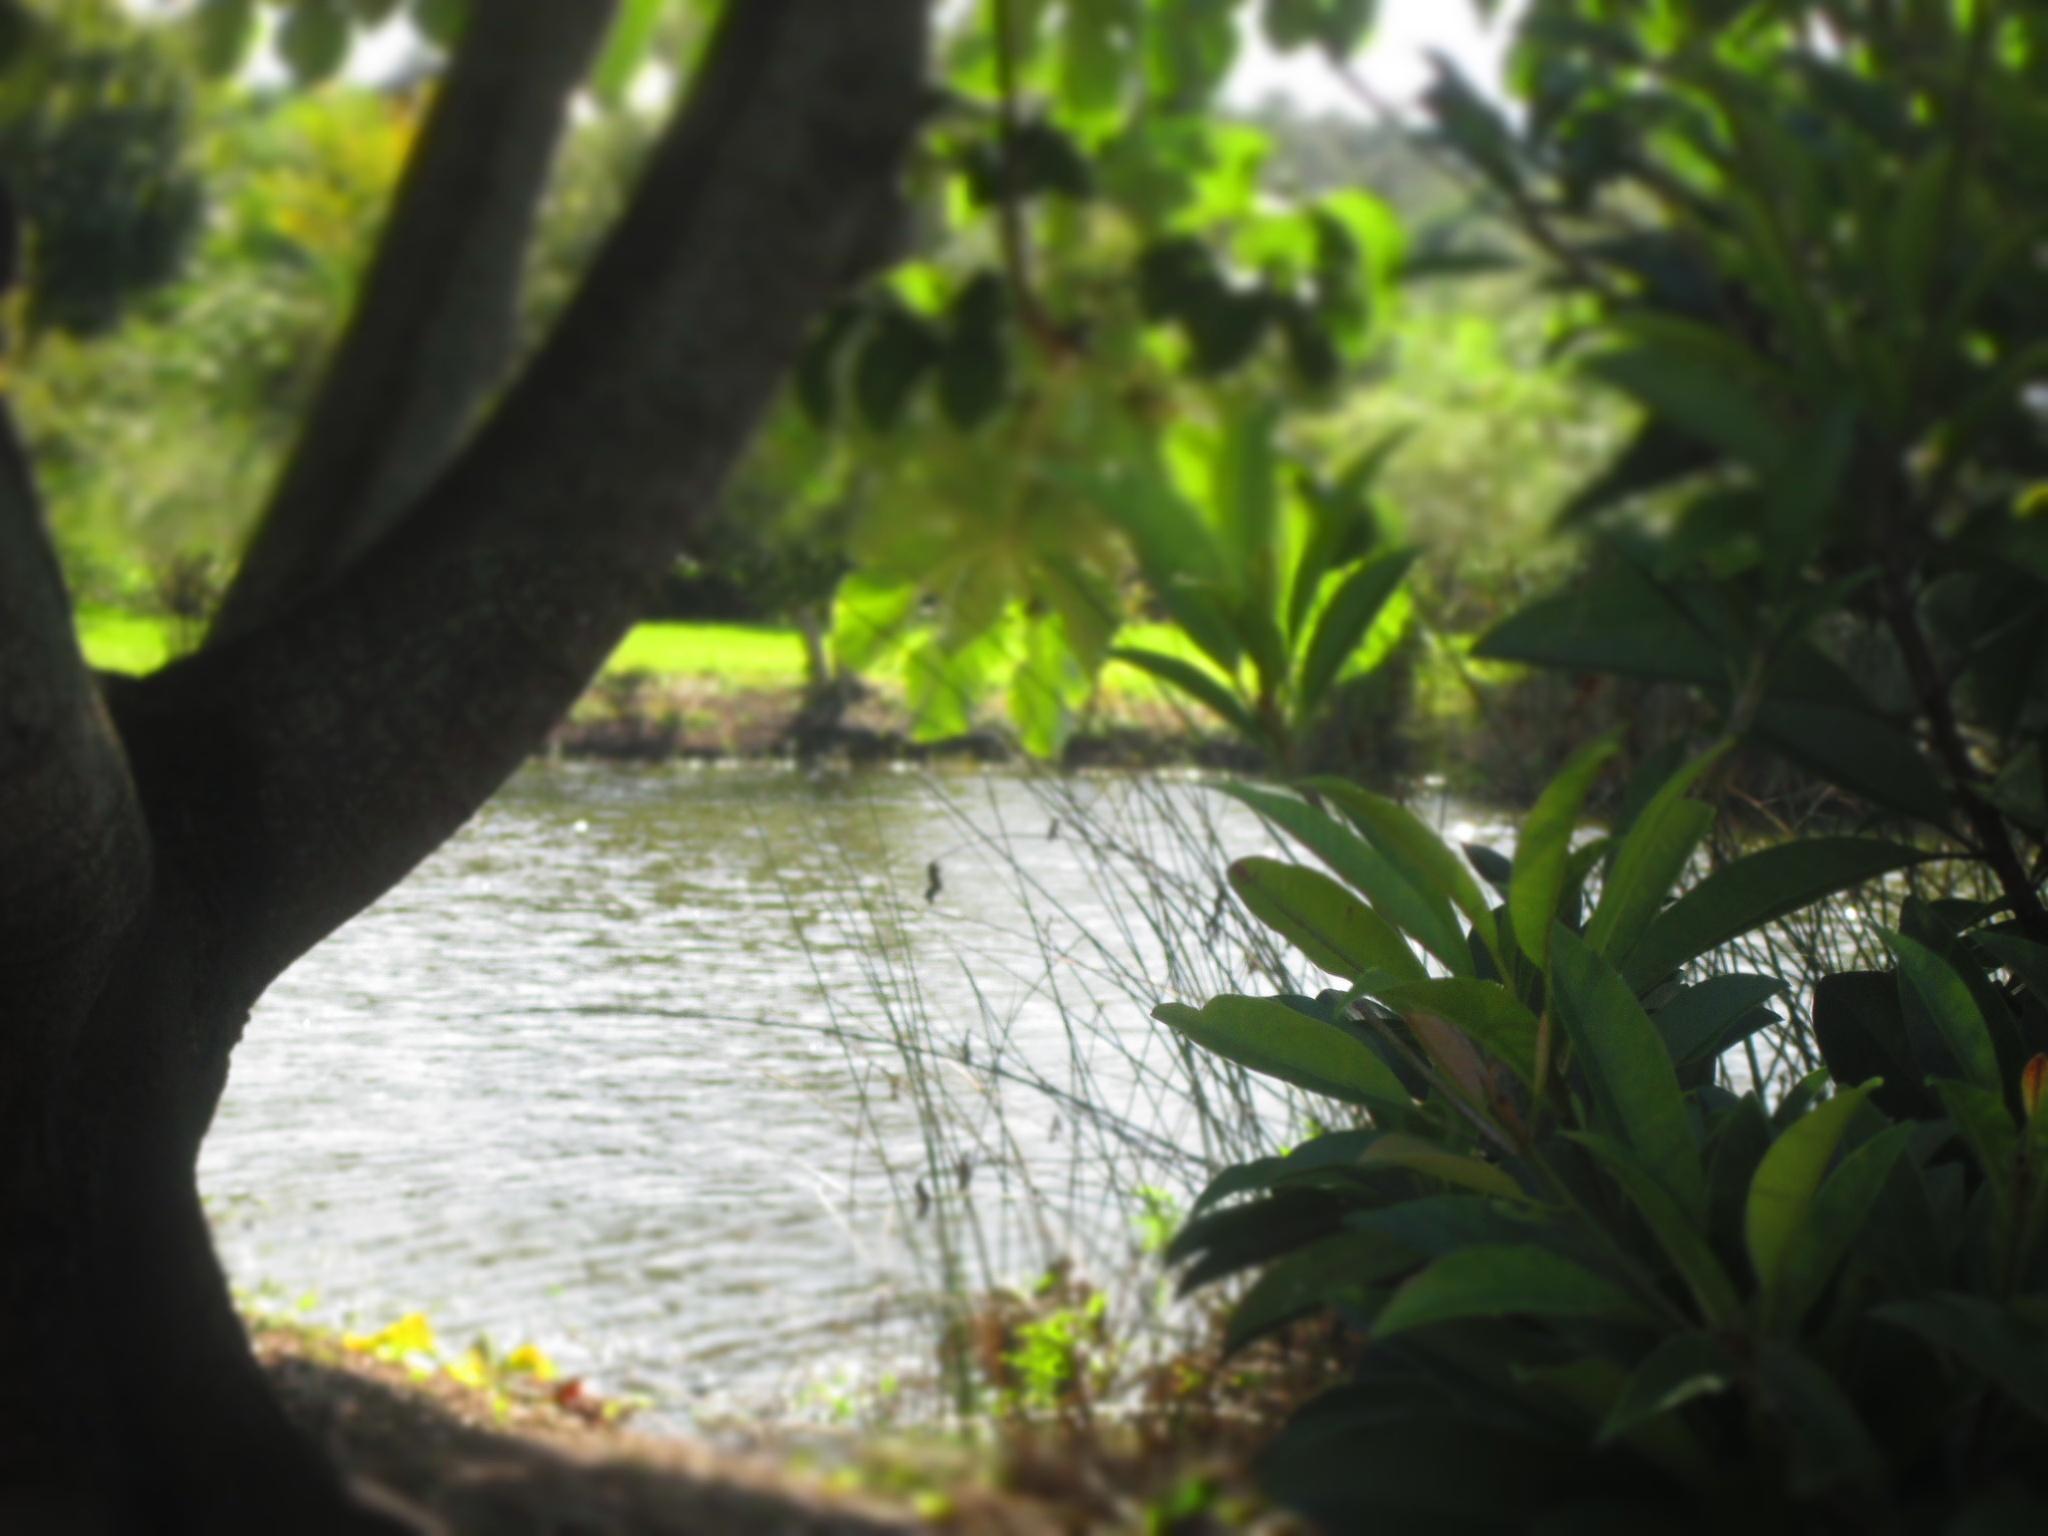 view through the trees by pamela.kanarr